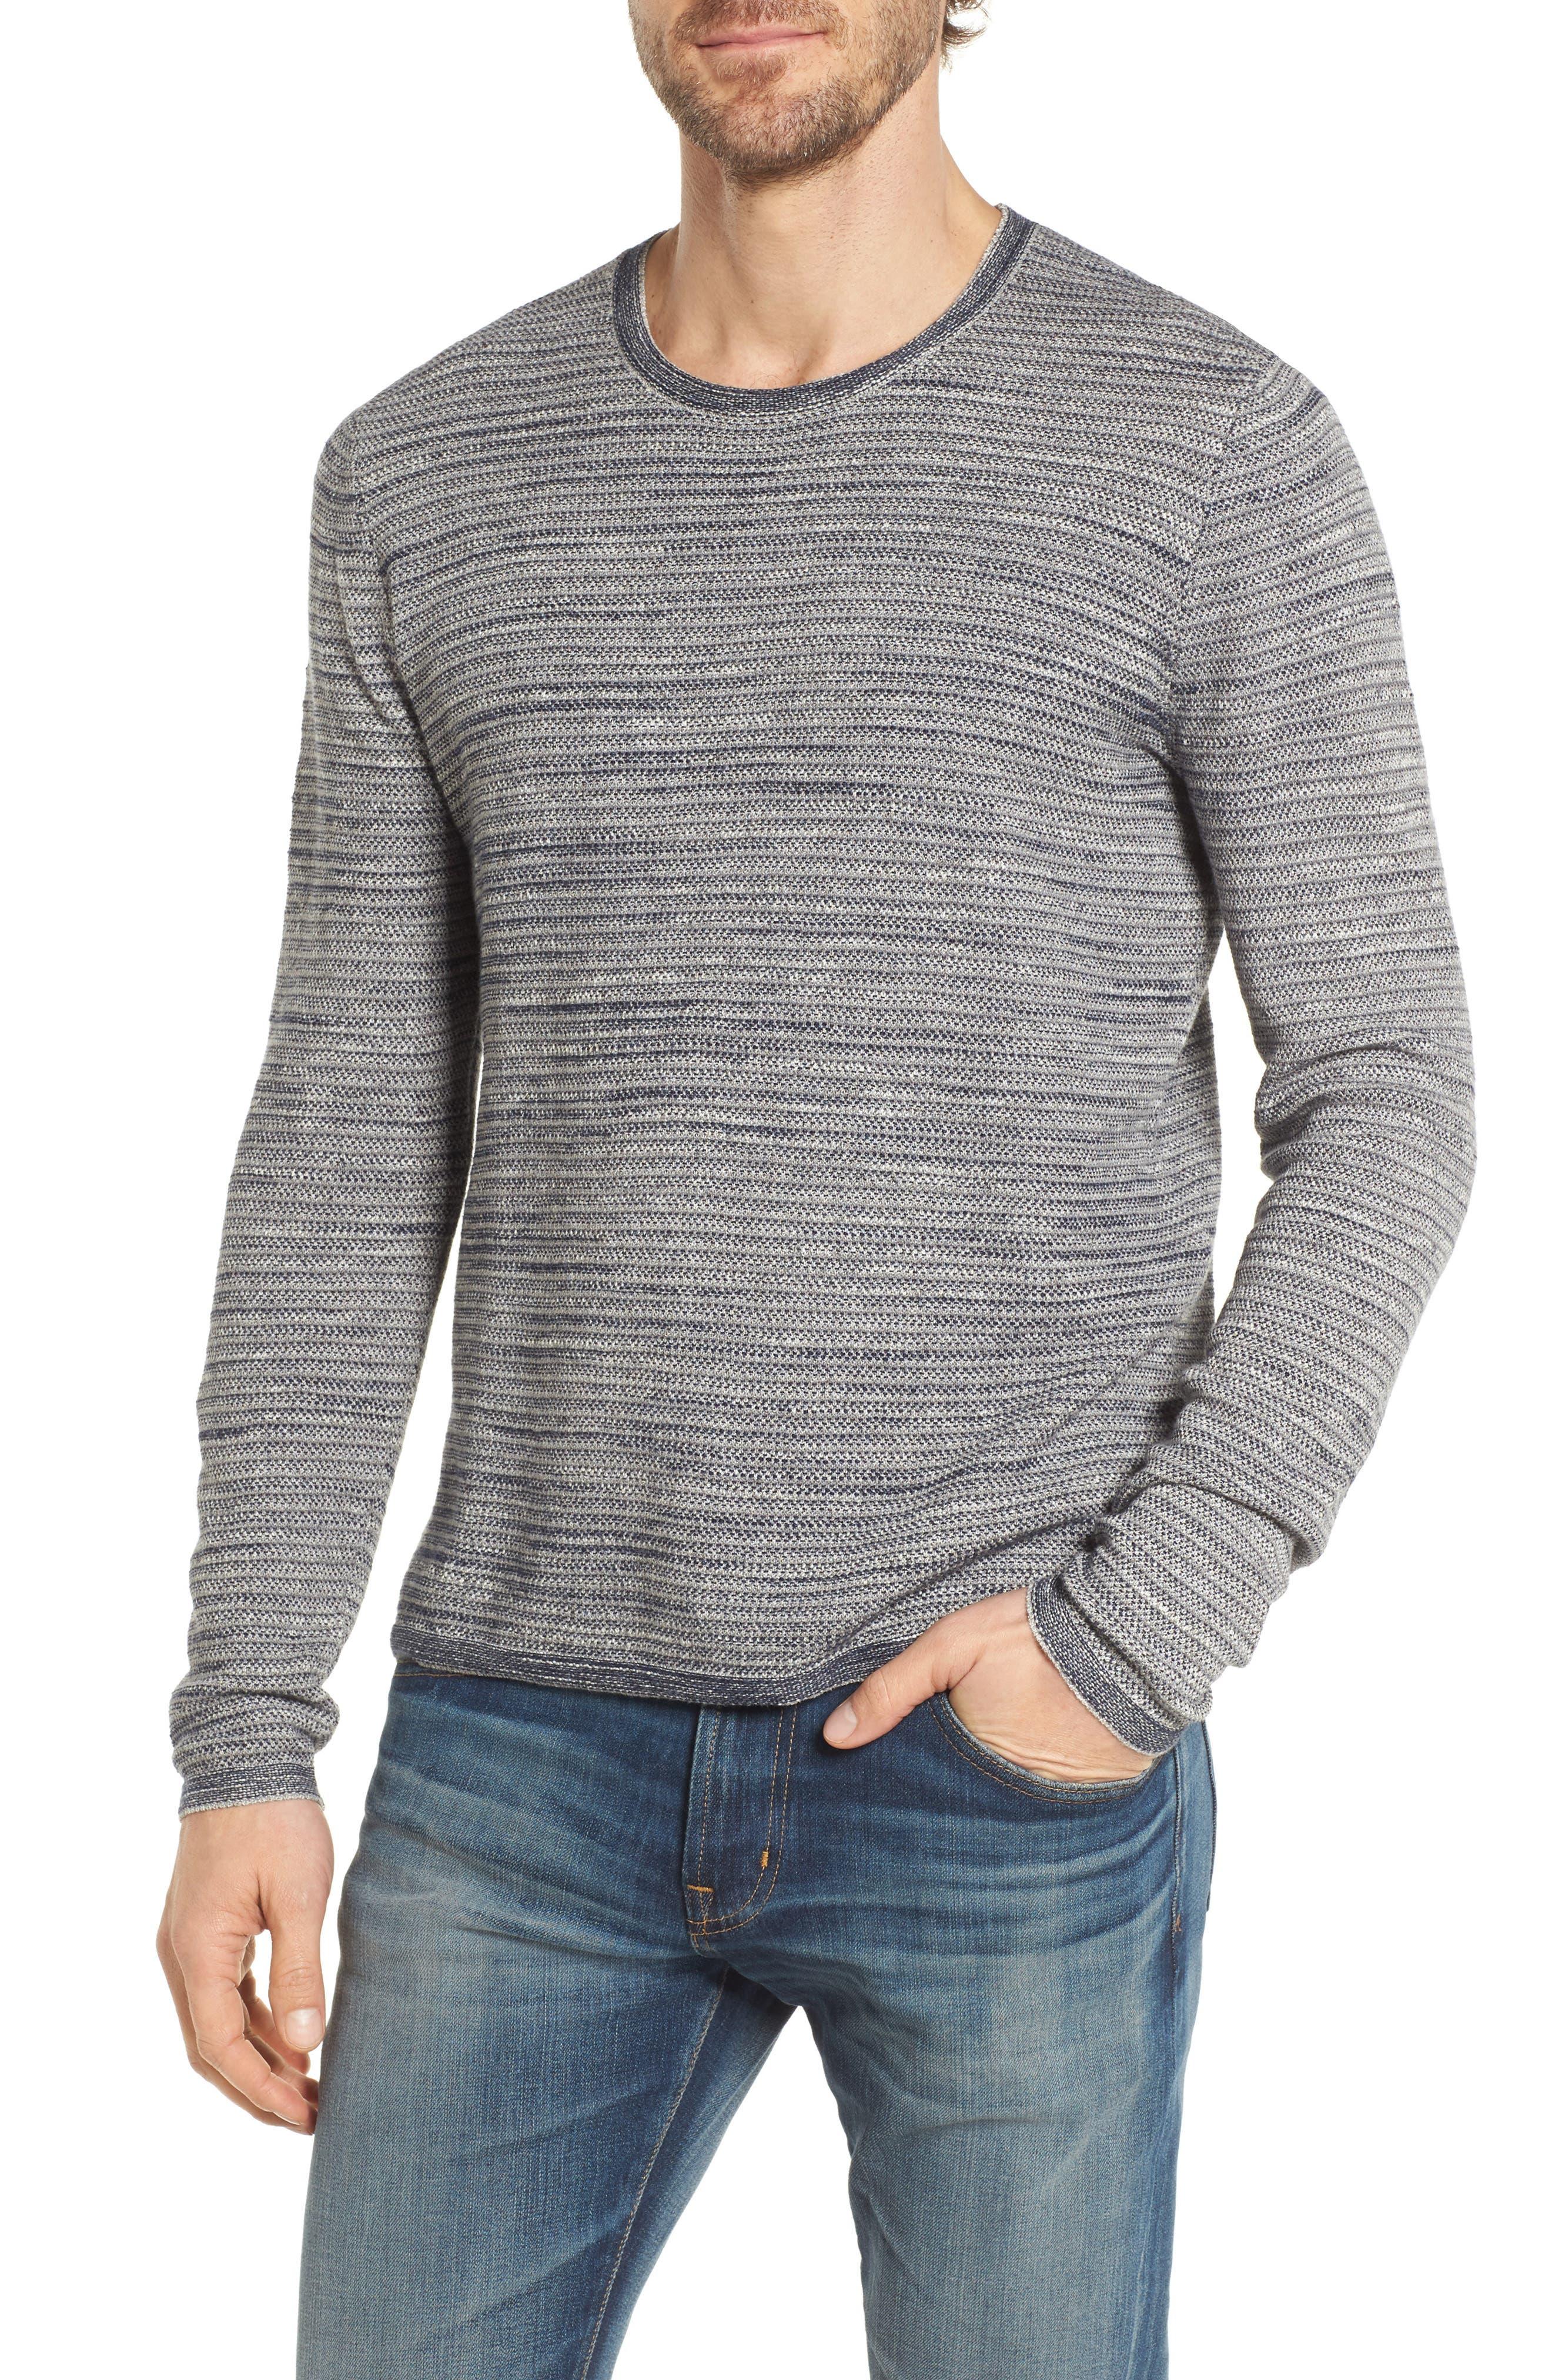 Grayers Bird's Eye Cotton Jacquard Sweater